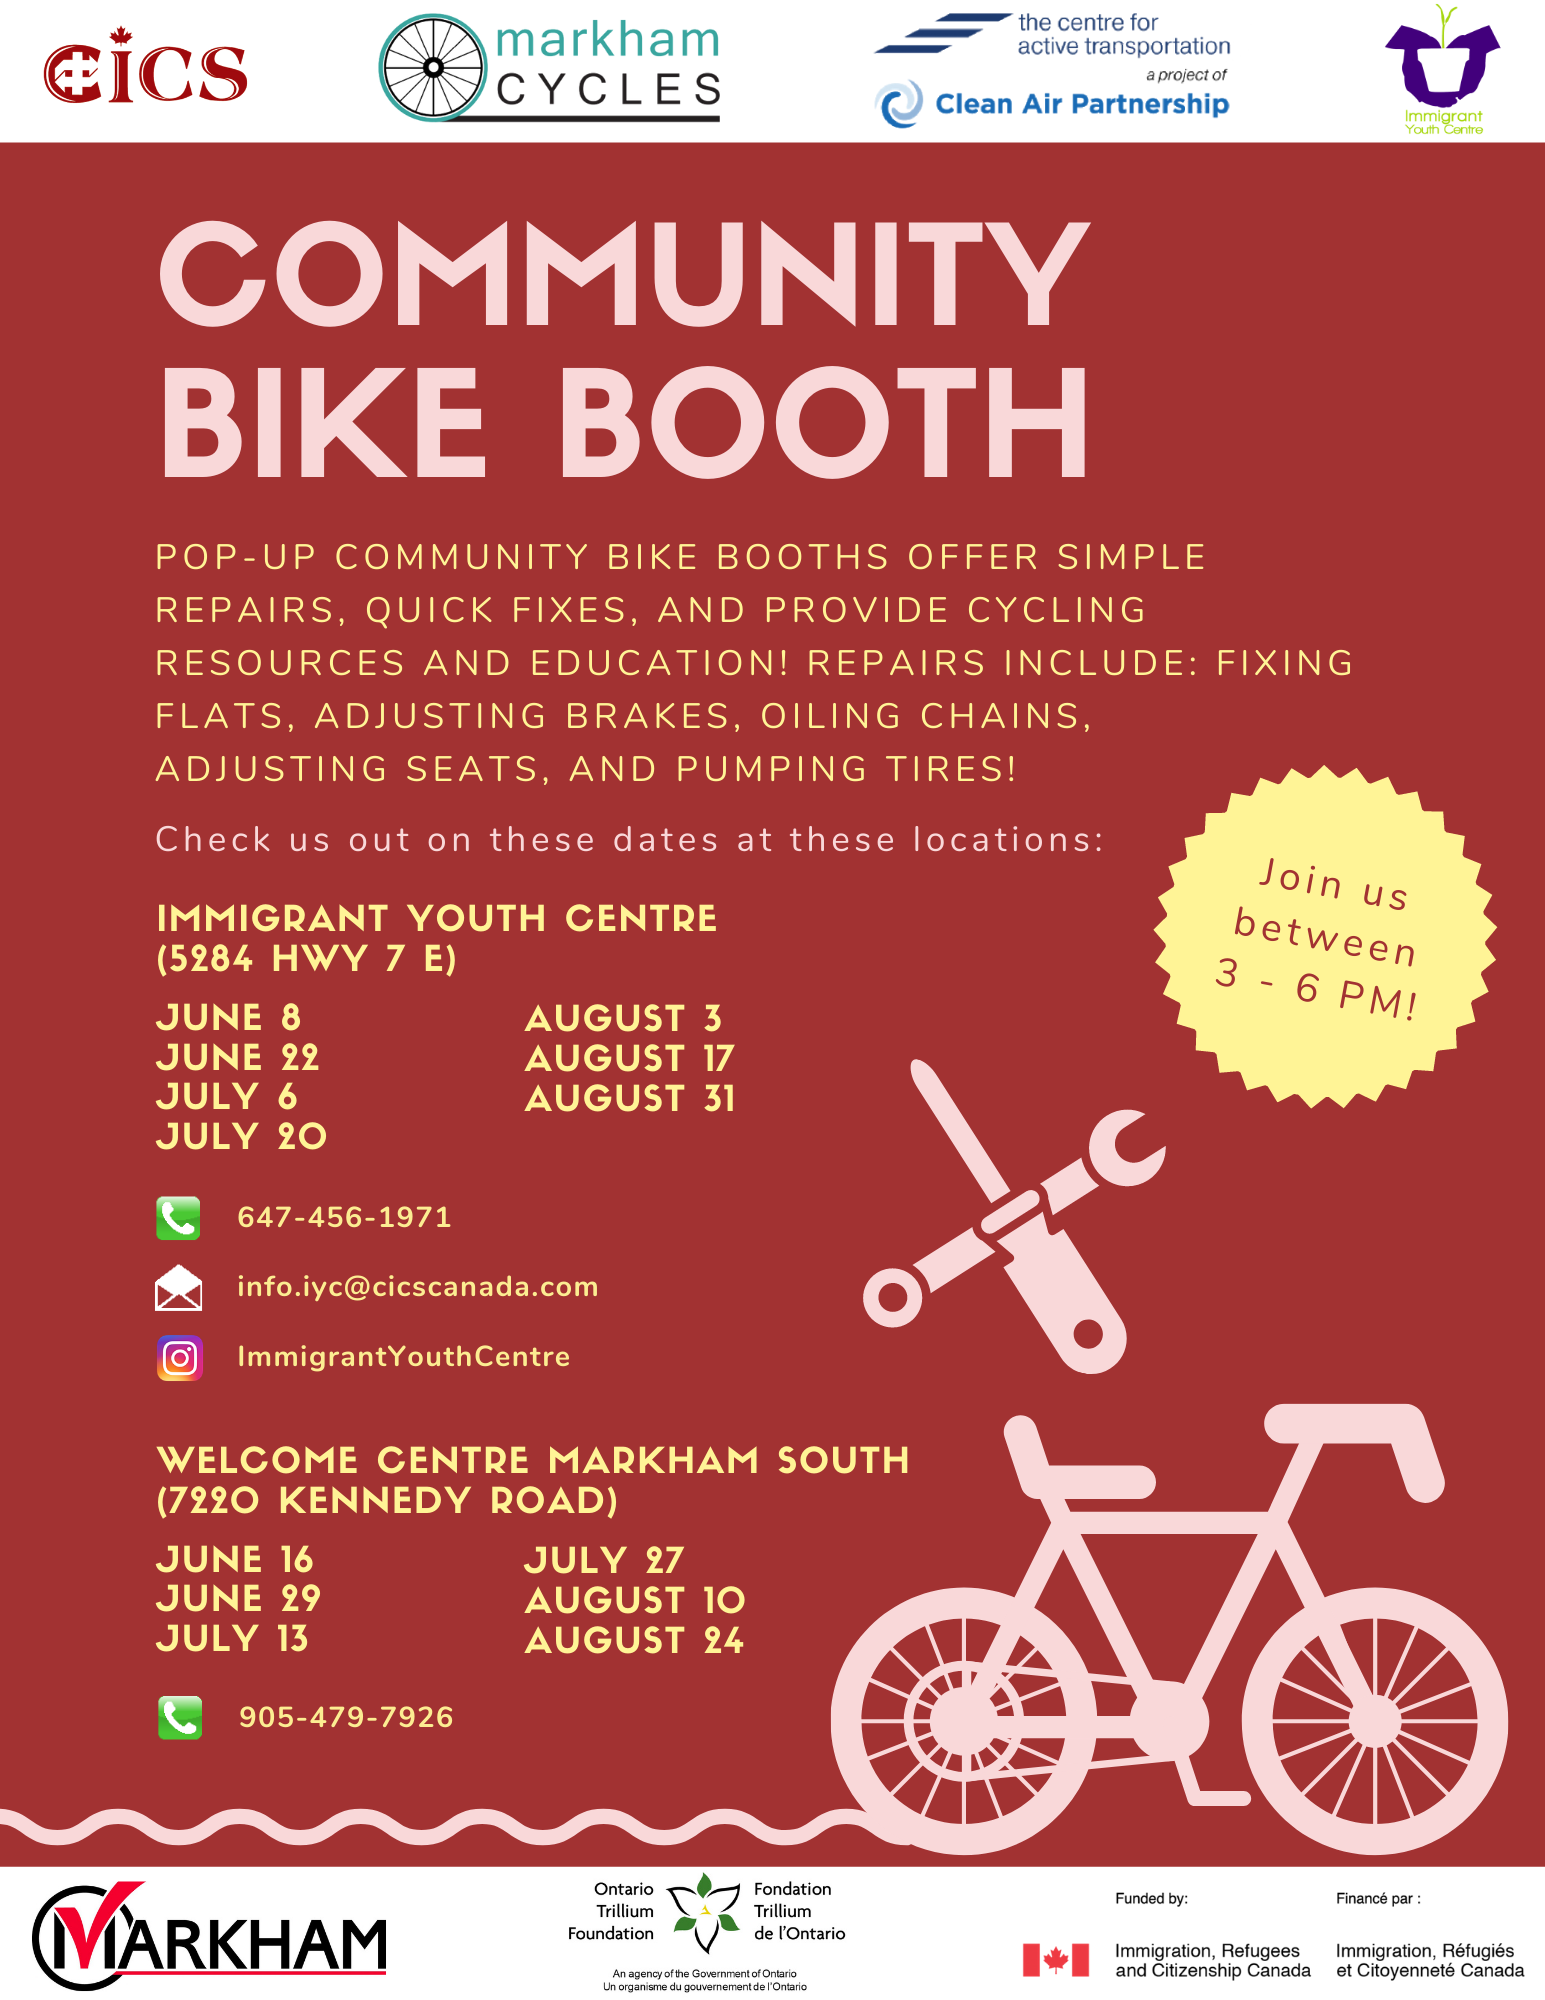 Community-Bike-Booth_Eng